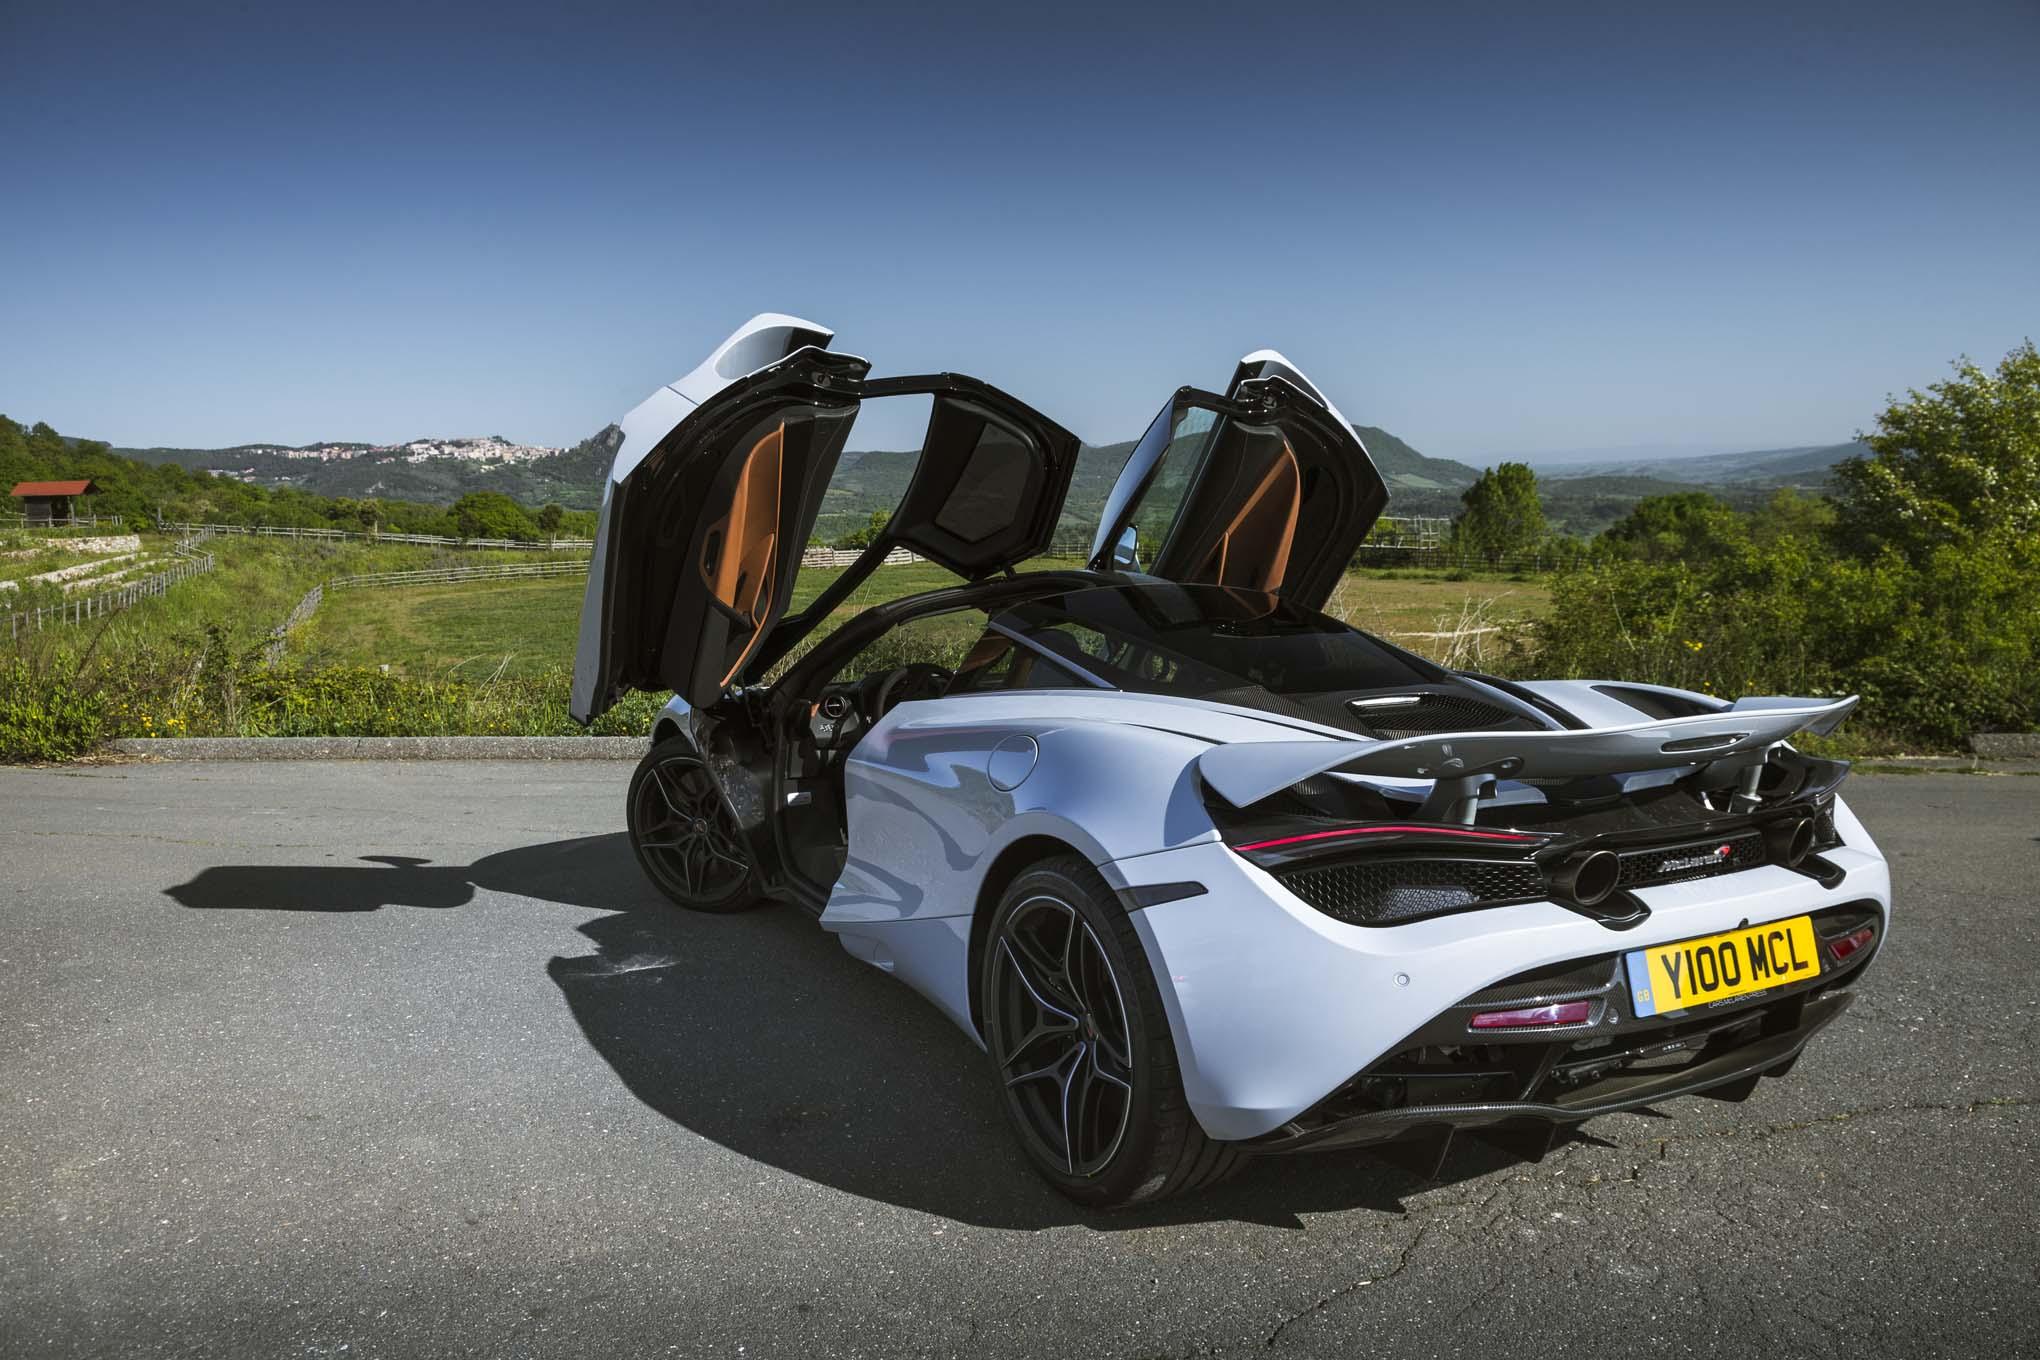 https://st.automobilemag.com/uploads/sites/11/2017/05/2018-McLaren-720S-rear-three-quarters-1.jpg